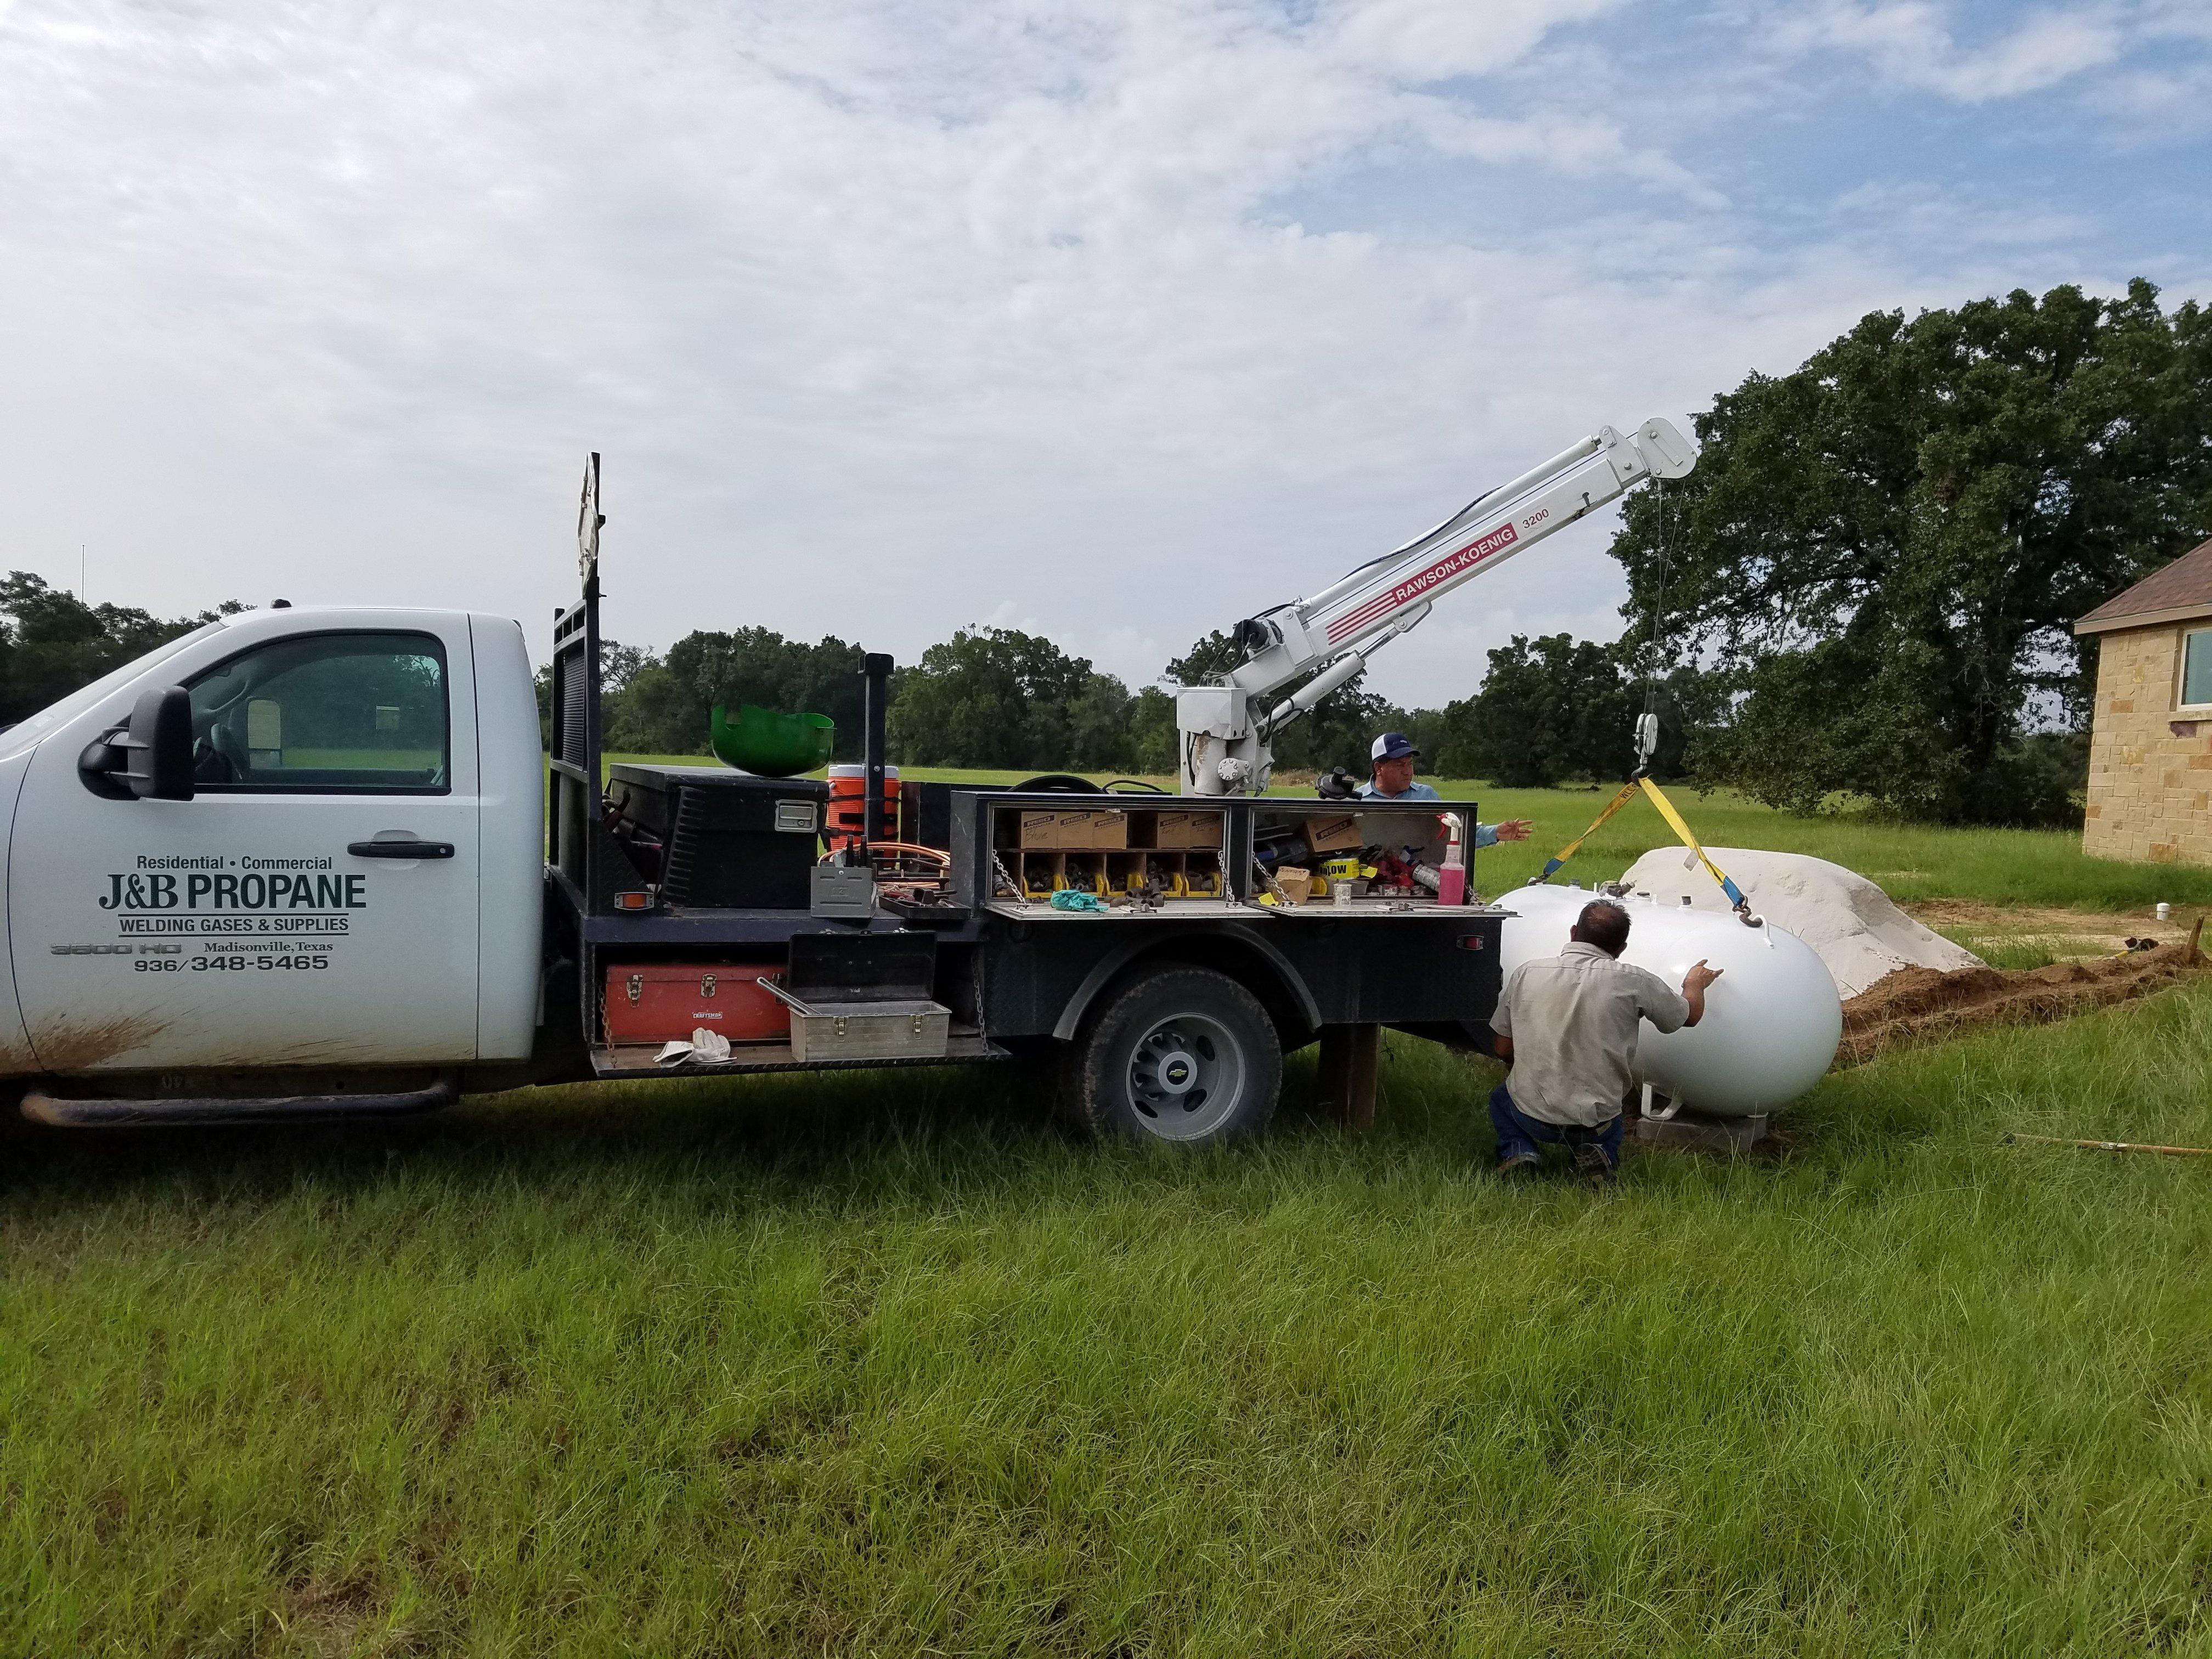 Tank Installation in Madisonville TX - J & B Propane